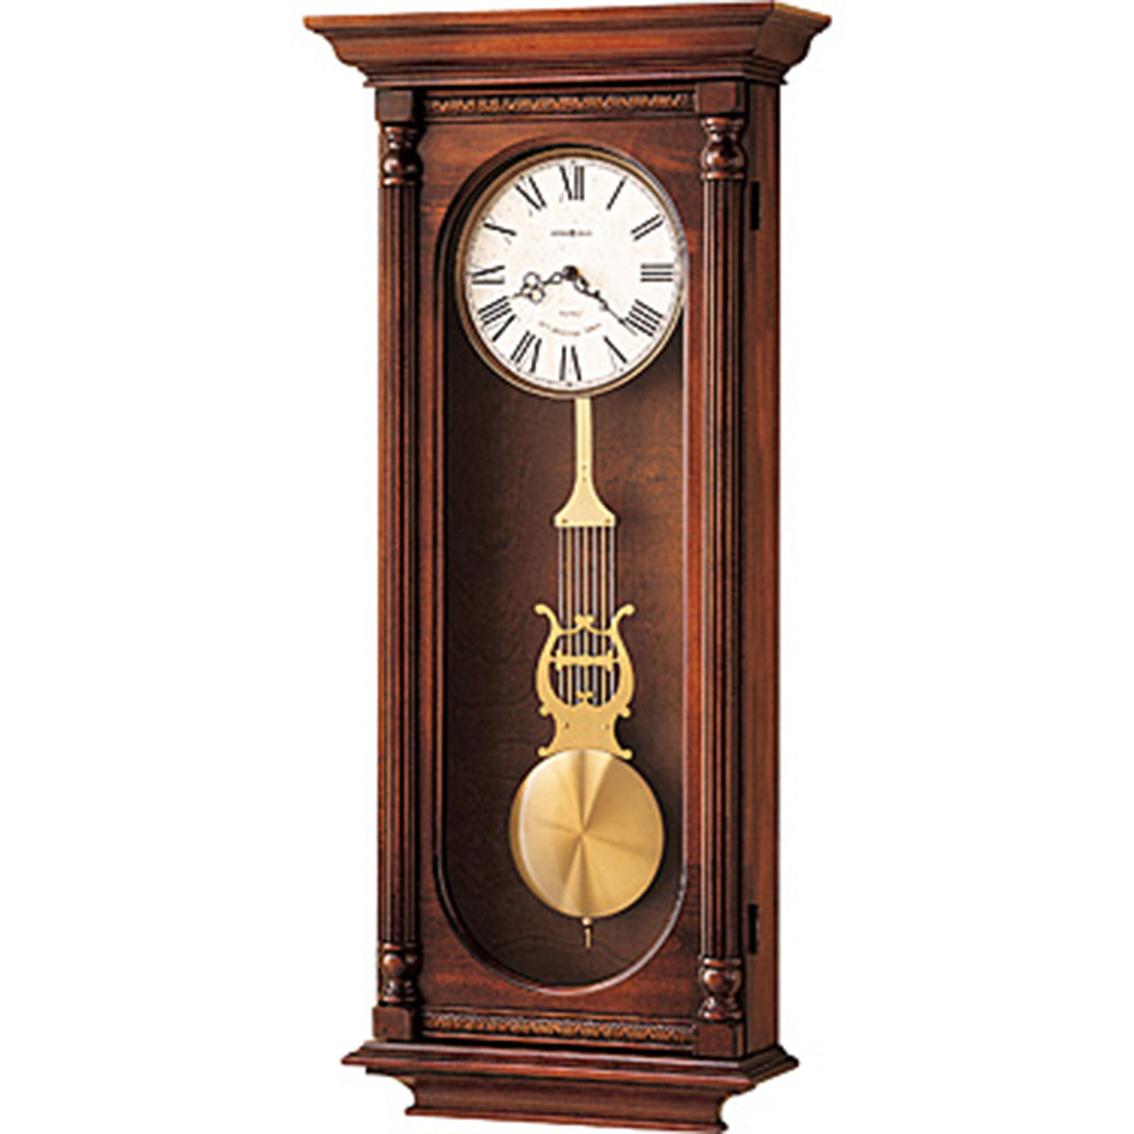 Howard miller helmsley wall clock clocks home appliances 5358 amipublicfo Gallery